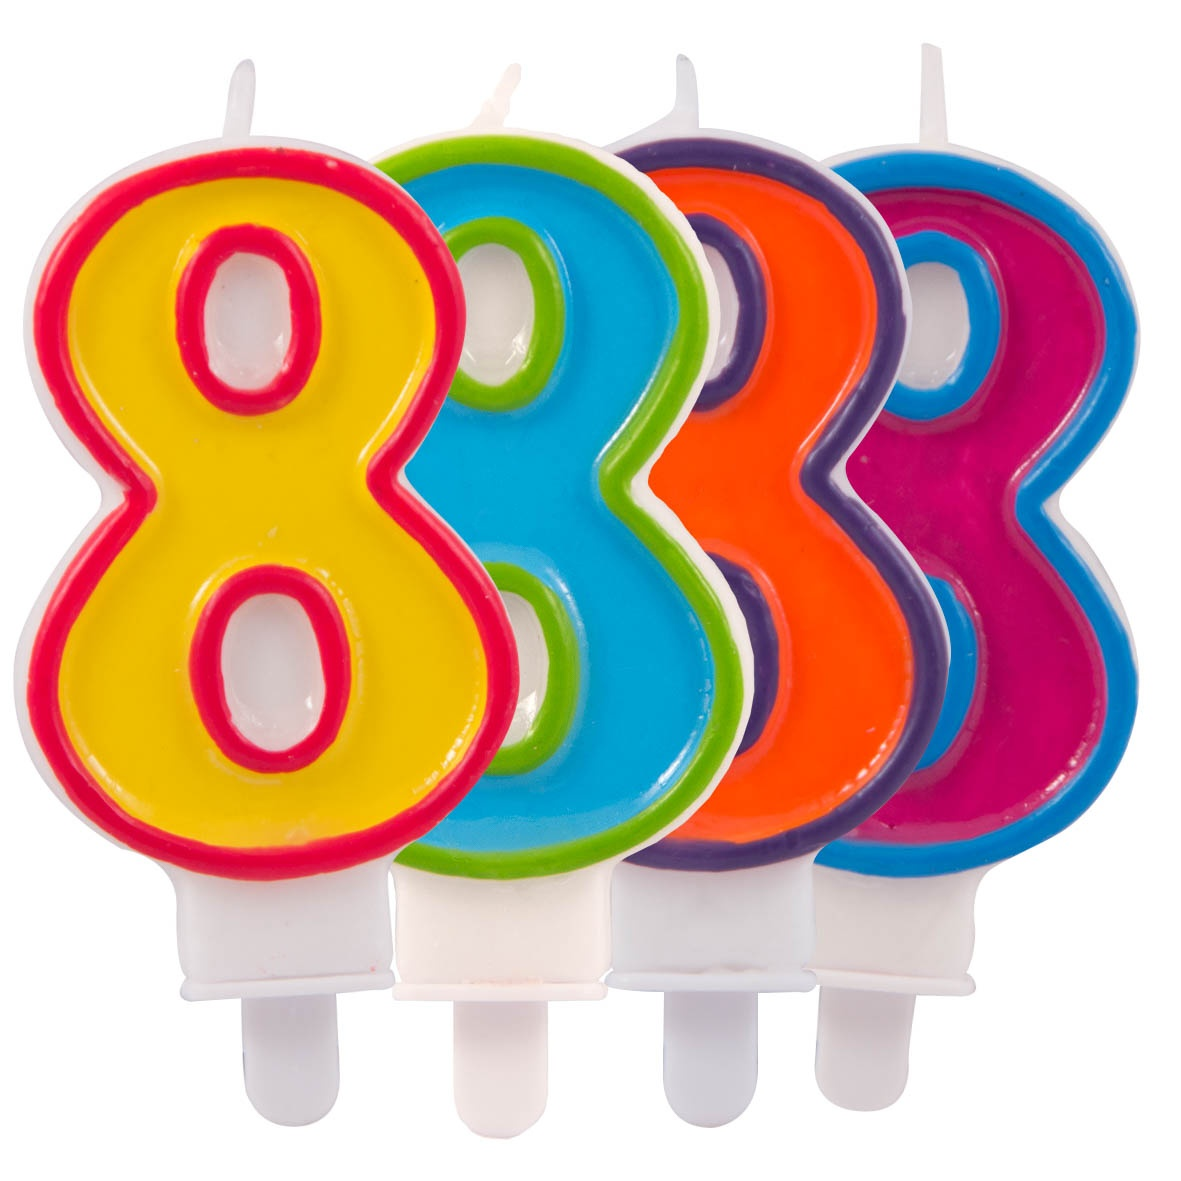 Zahlenkerze  8 4-fach sortiert - ca 7,5 cm